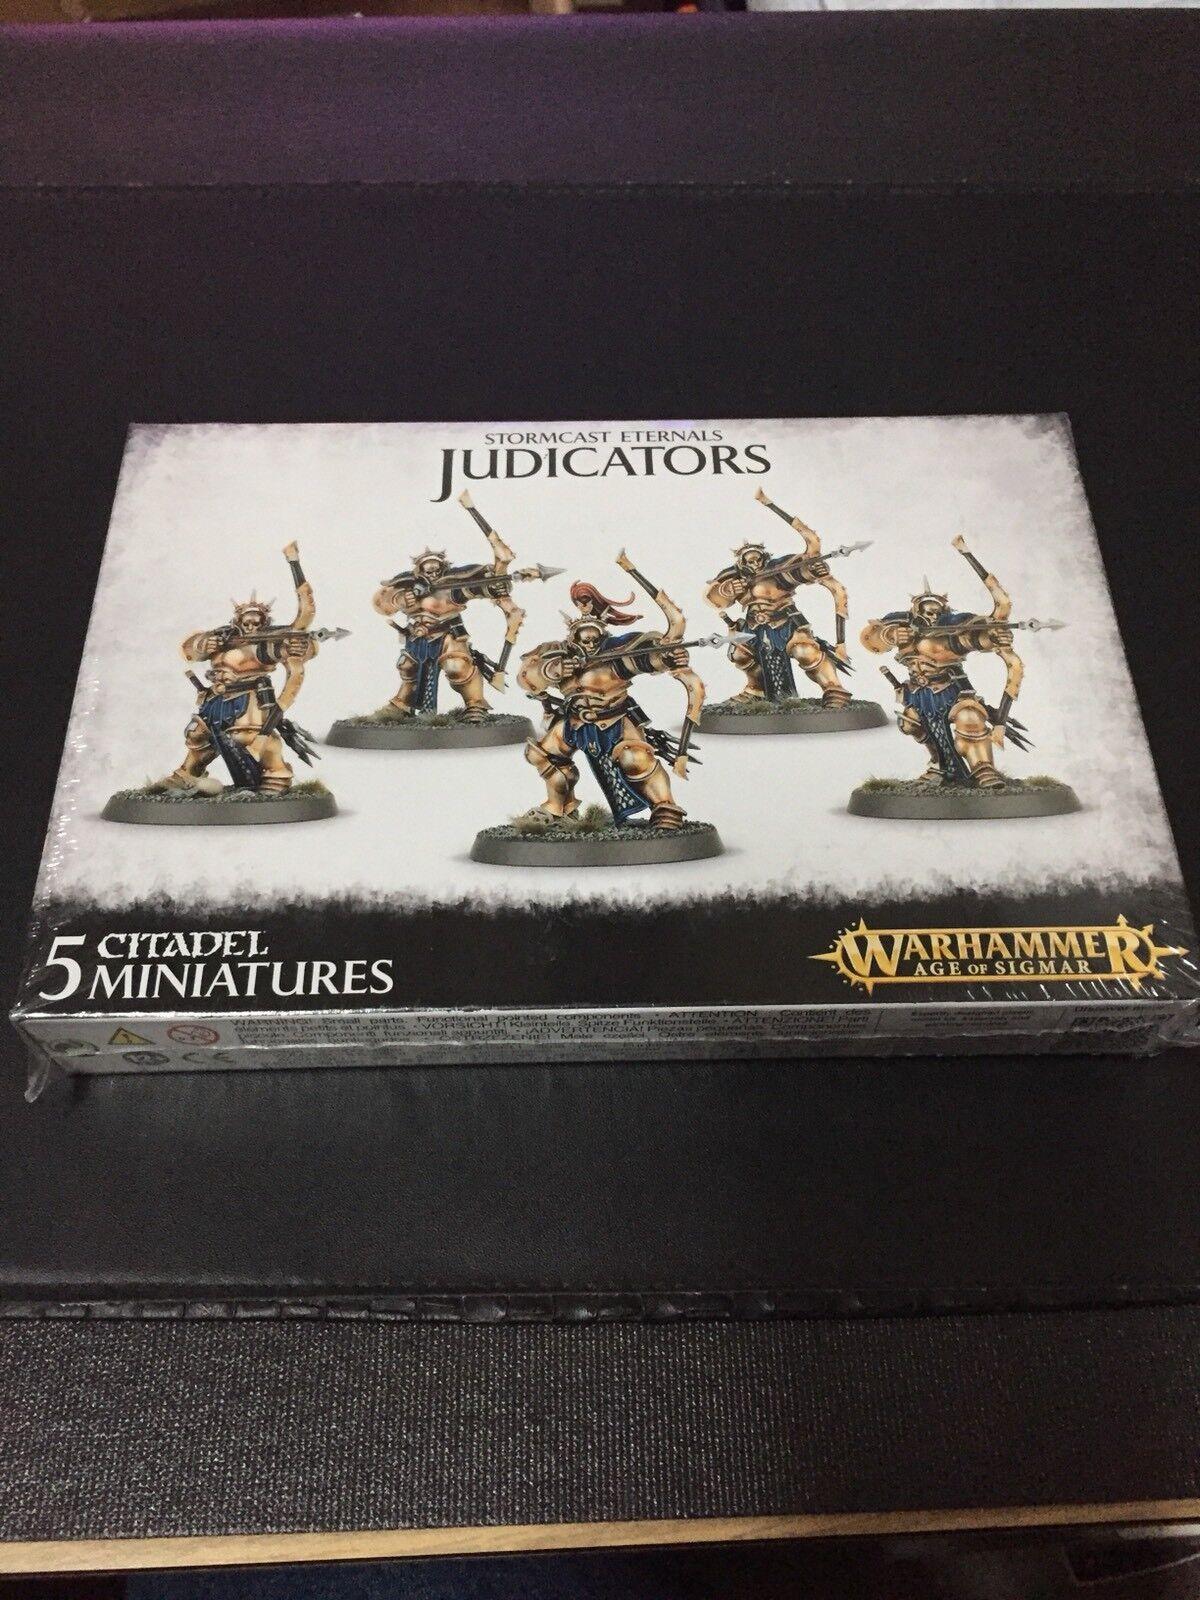 2015 Citadel Warhammer Age of Sigmar Stormcast Eternals Judicators